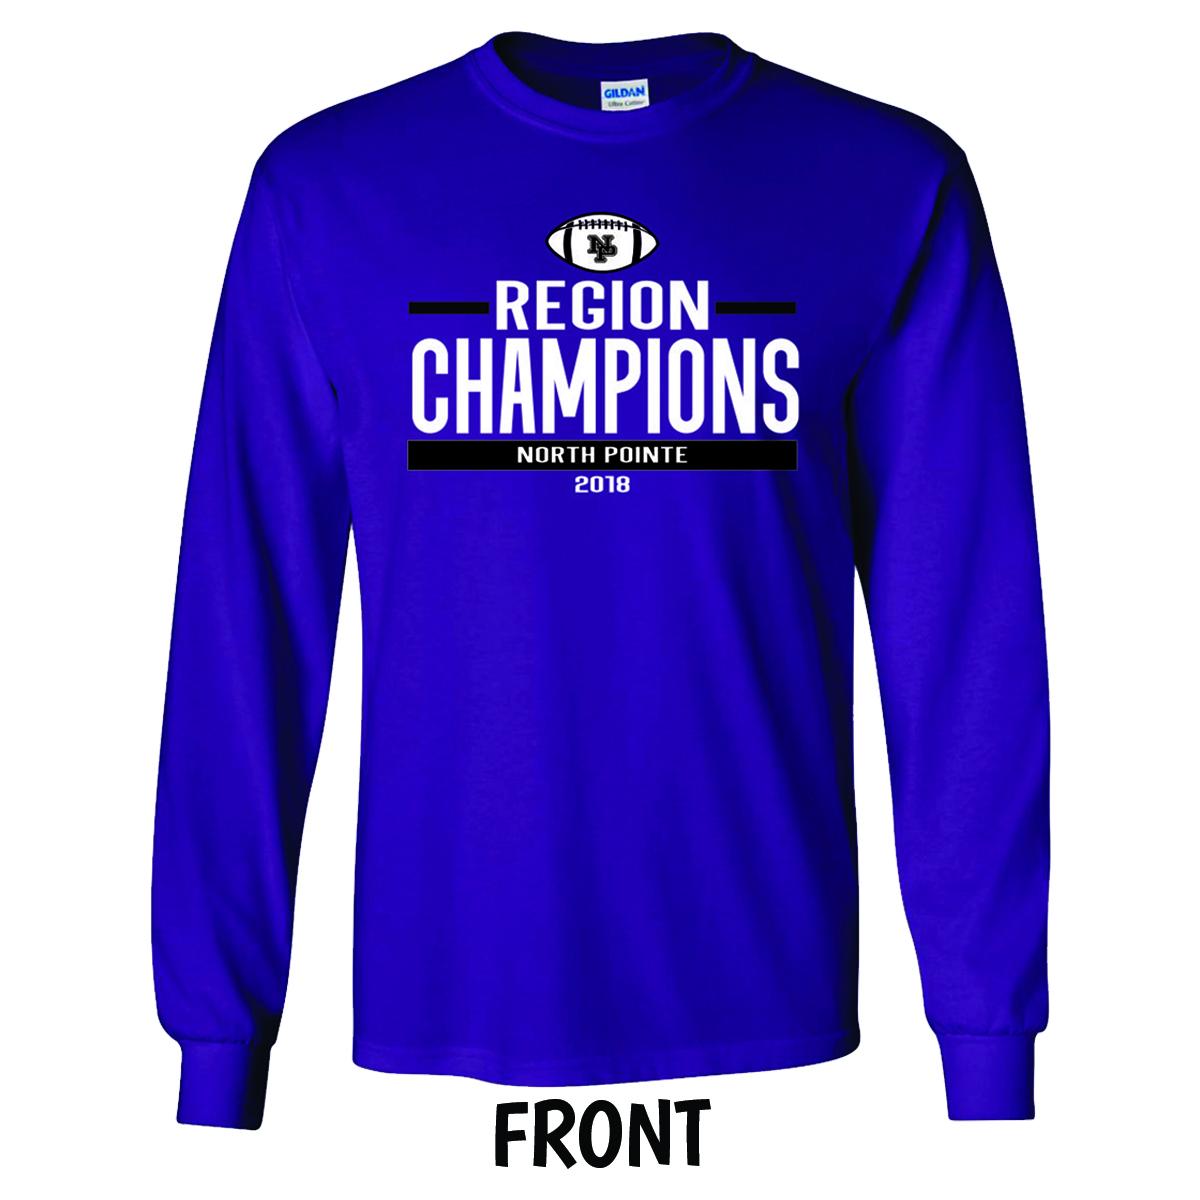 f6a9443ed981 4x4 RegionChampsGear shirt.jpg. Region Champions (long sleeve)